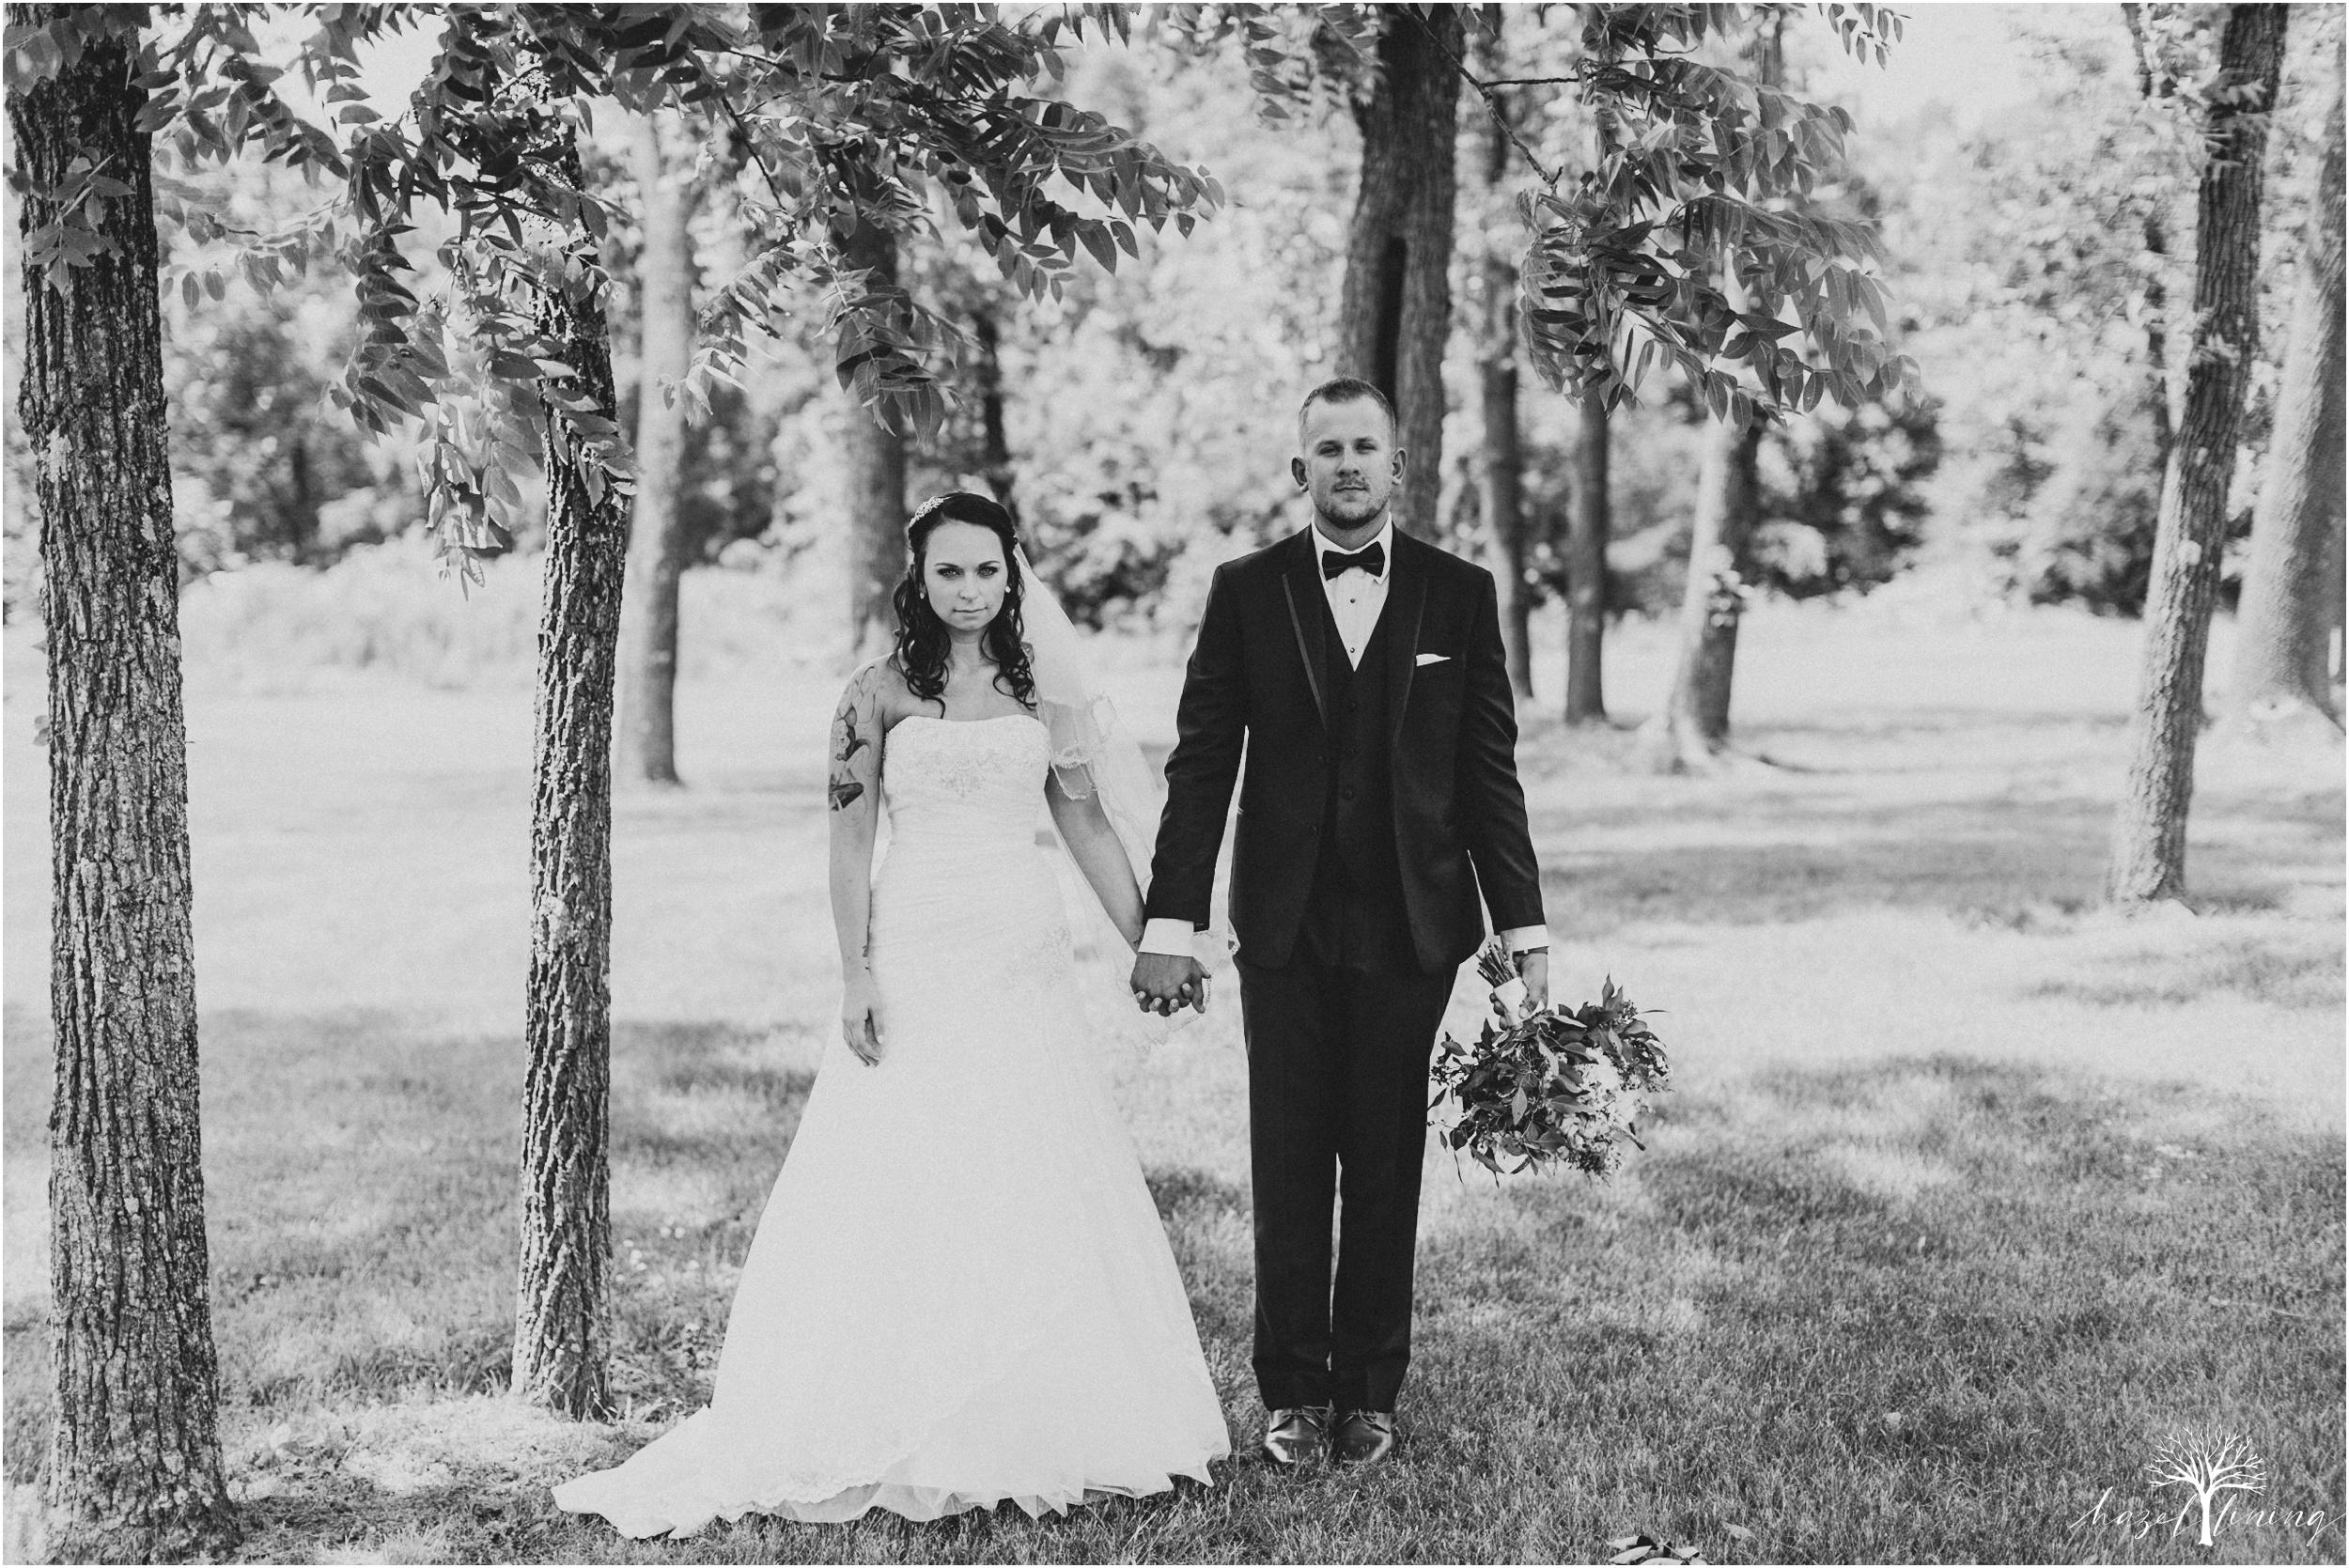 alyssa-james-stiteler-wedding-loft-and-sweet-water-cc-pennsburg-pennsylvania-hazel-lining-travel-wedding-elopement-photography_0043.jpg